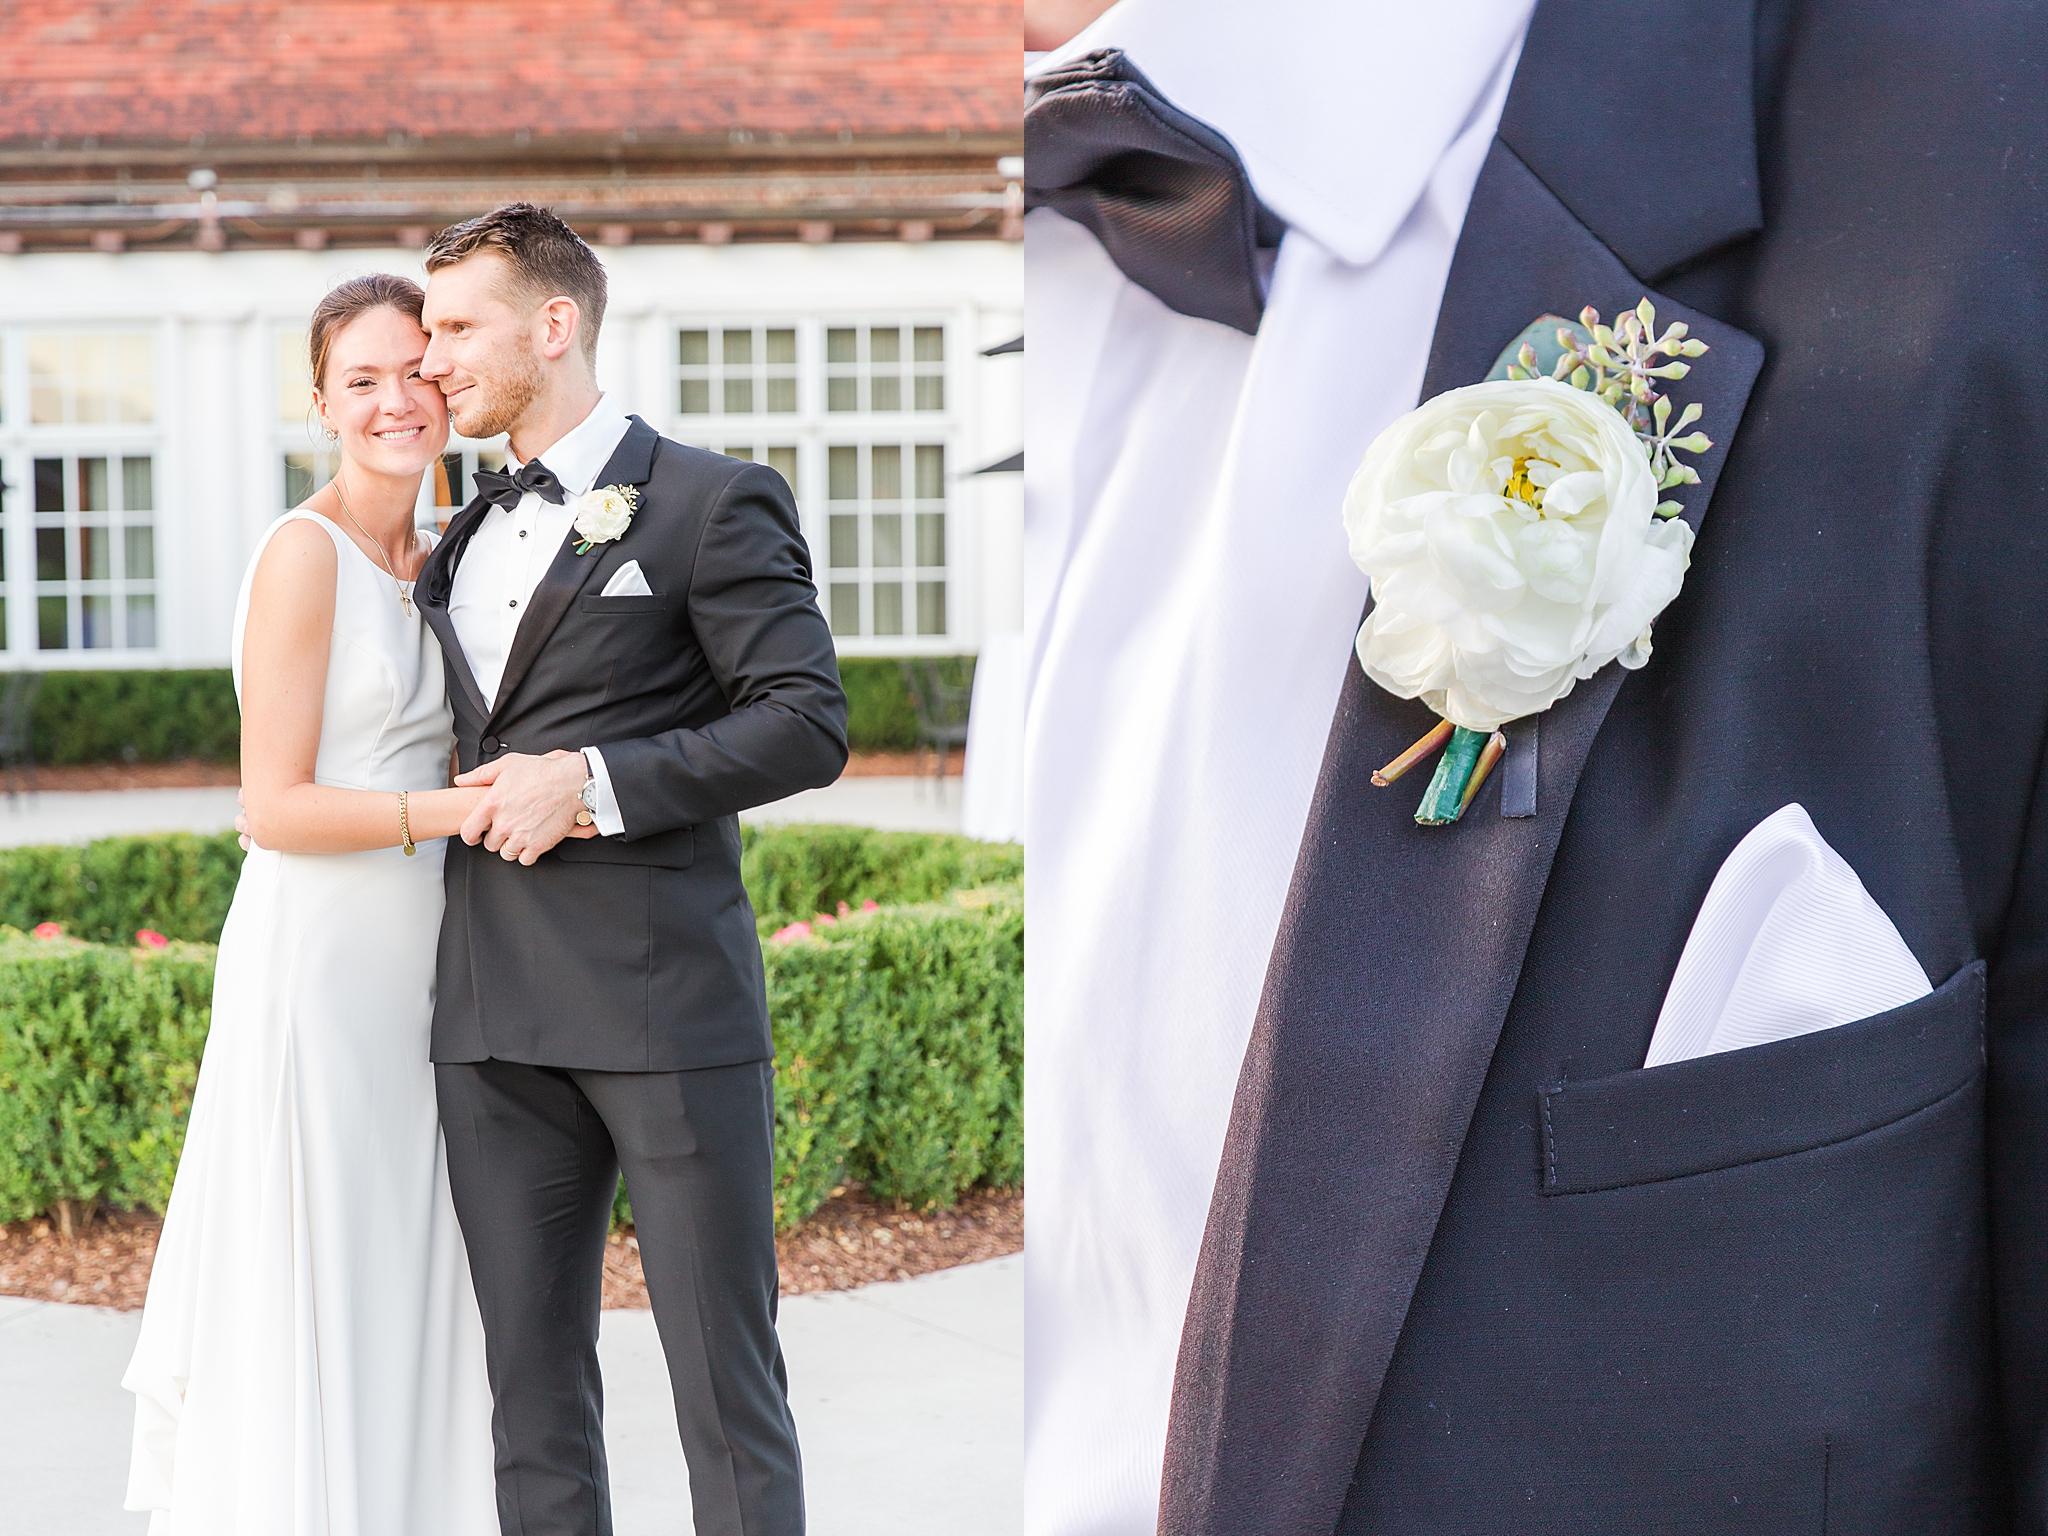 detroit-wedding-photographer-grosse-pointe-academy-chapel-detroit-golf-club-wedding-carly-matt-by-courtney-carolyn-photography_0110.jpg